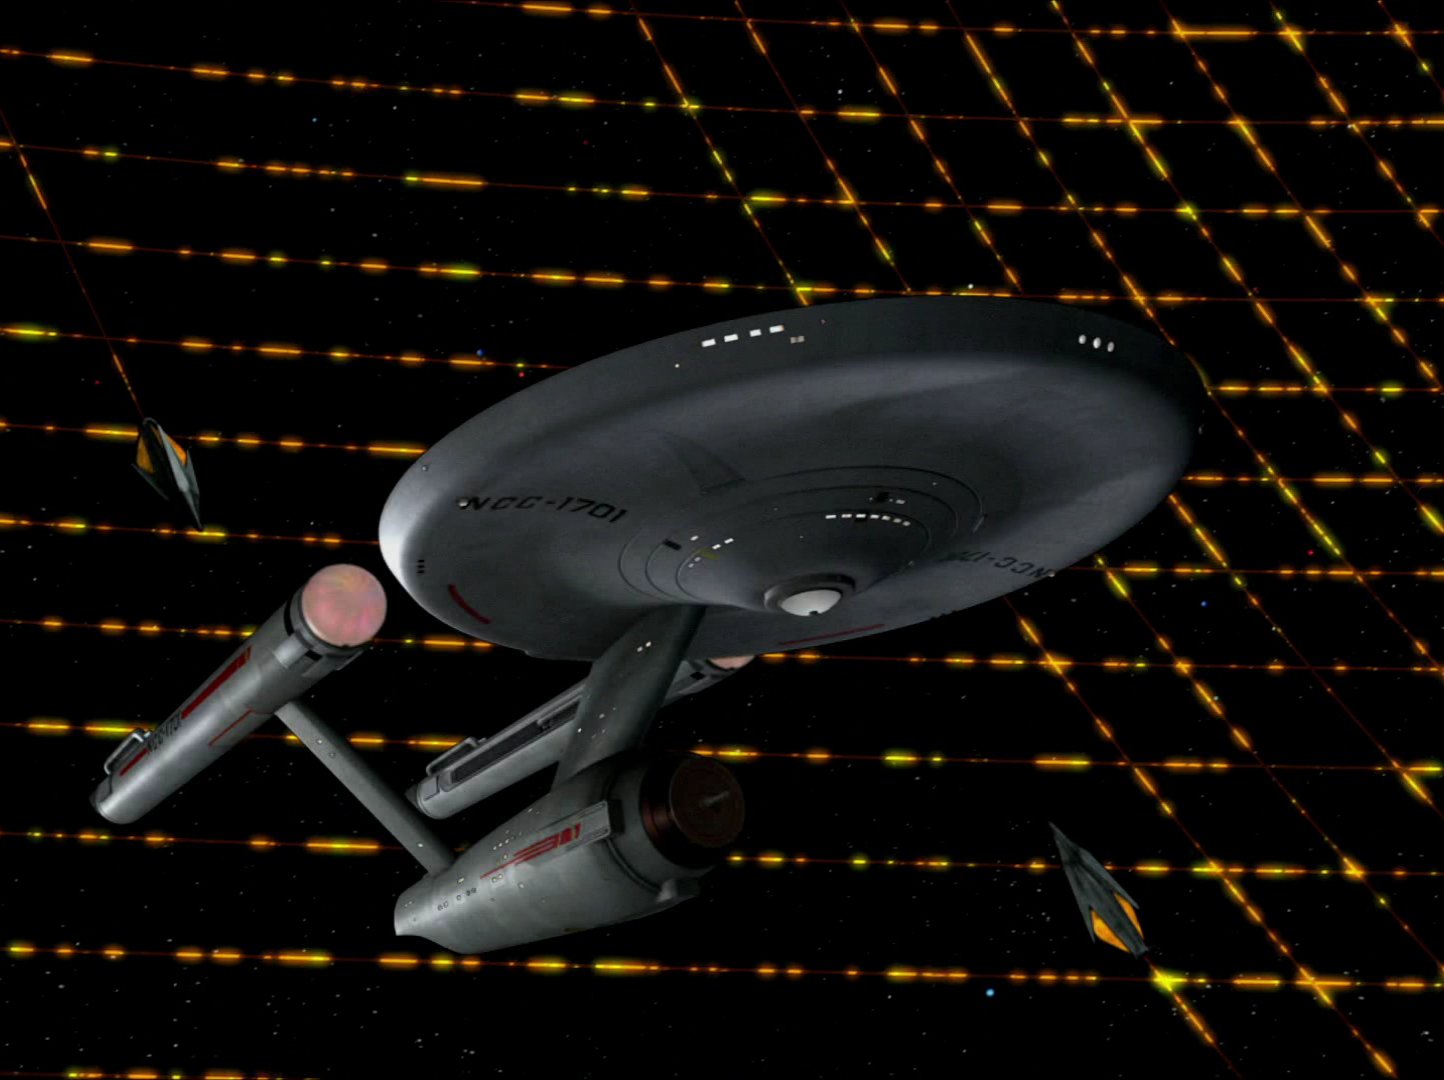 USS Enterprise NCC-1701 REVELL TOS3x09i